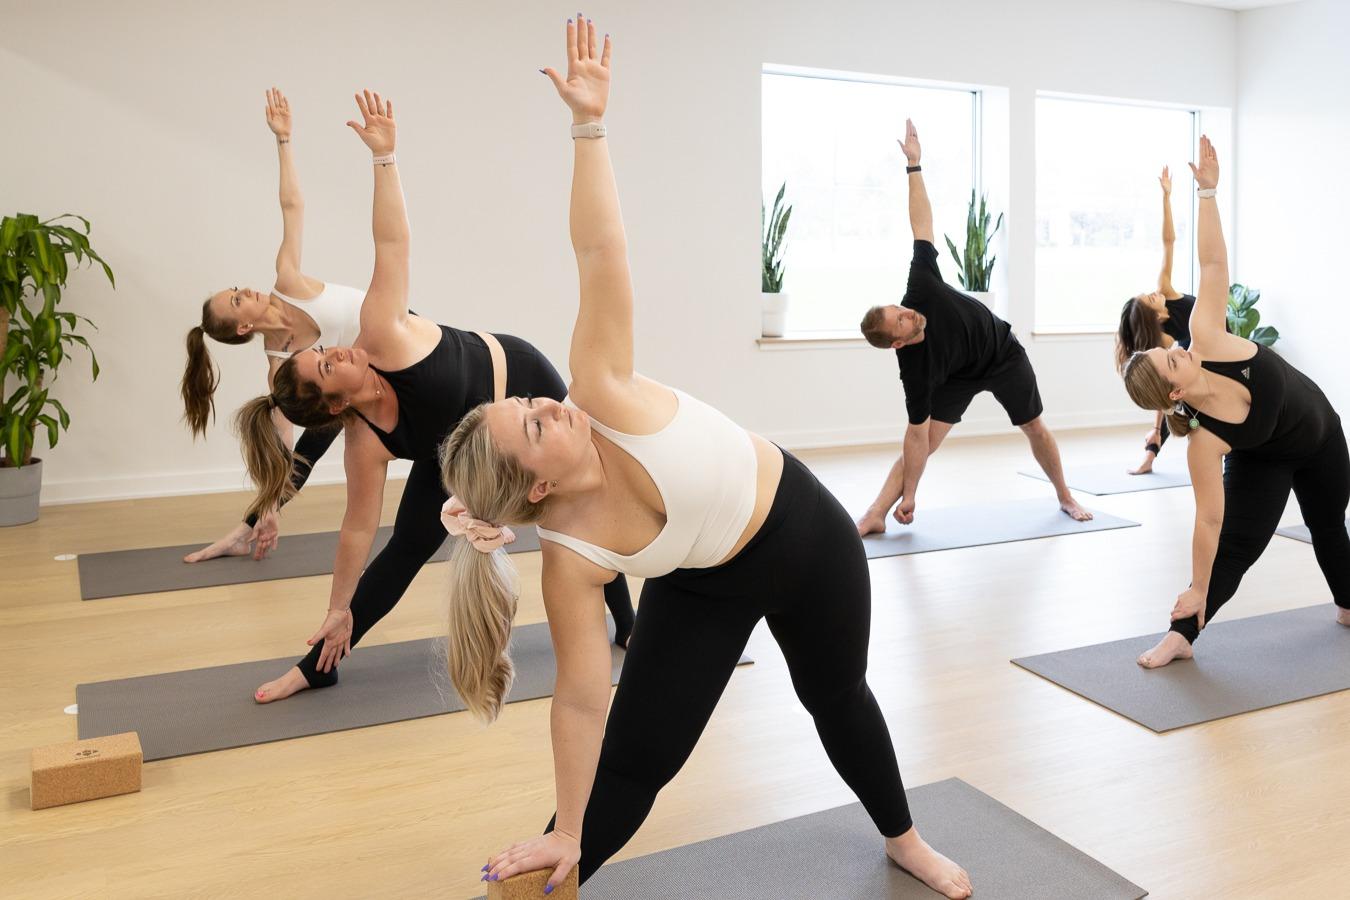 Sweat Shop Hot Yoga Oconomowoc Yoga Group Class 1 Resize